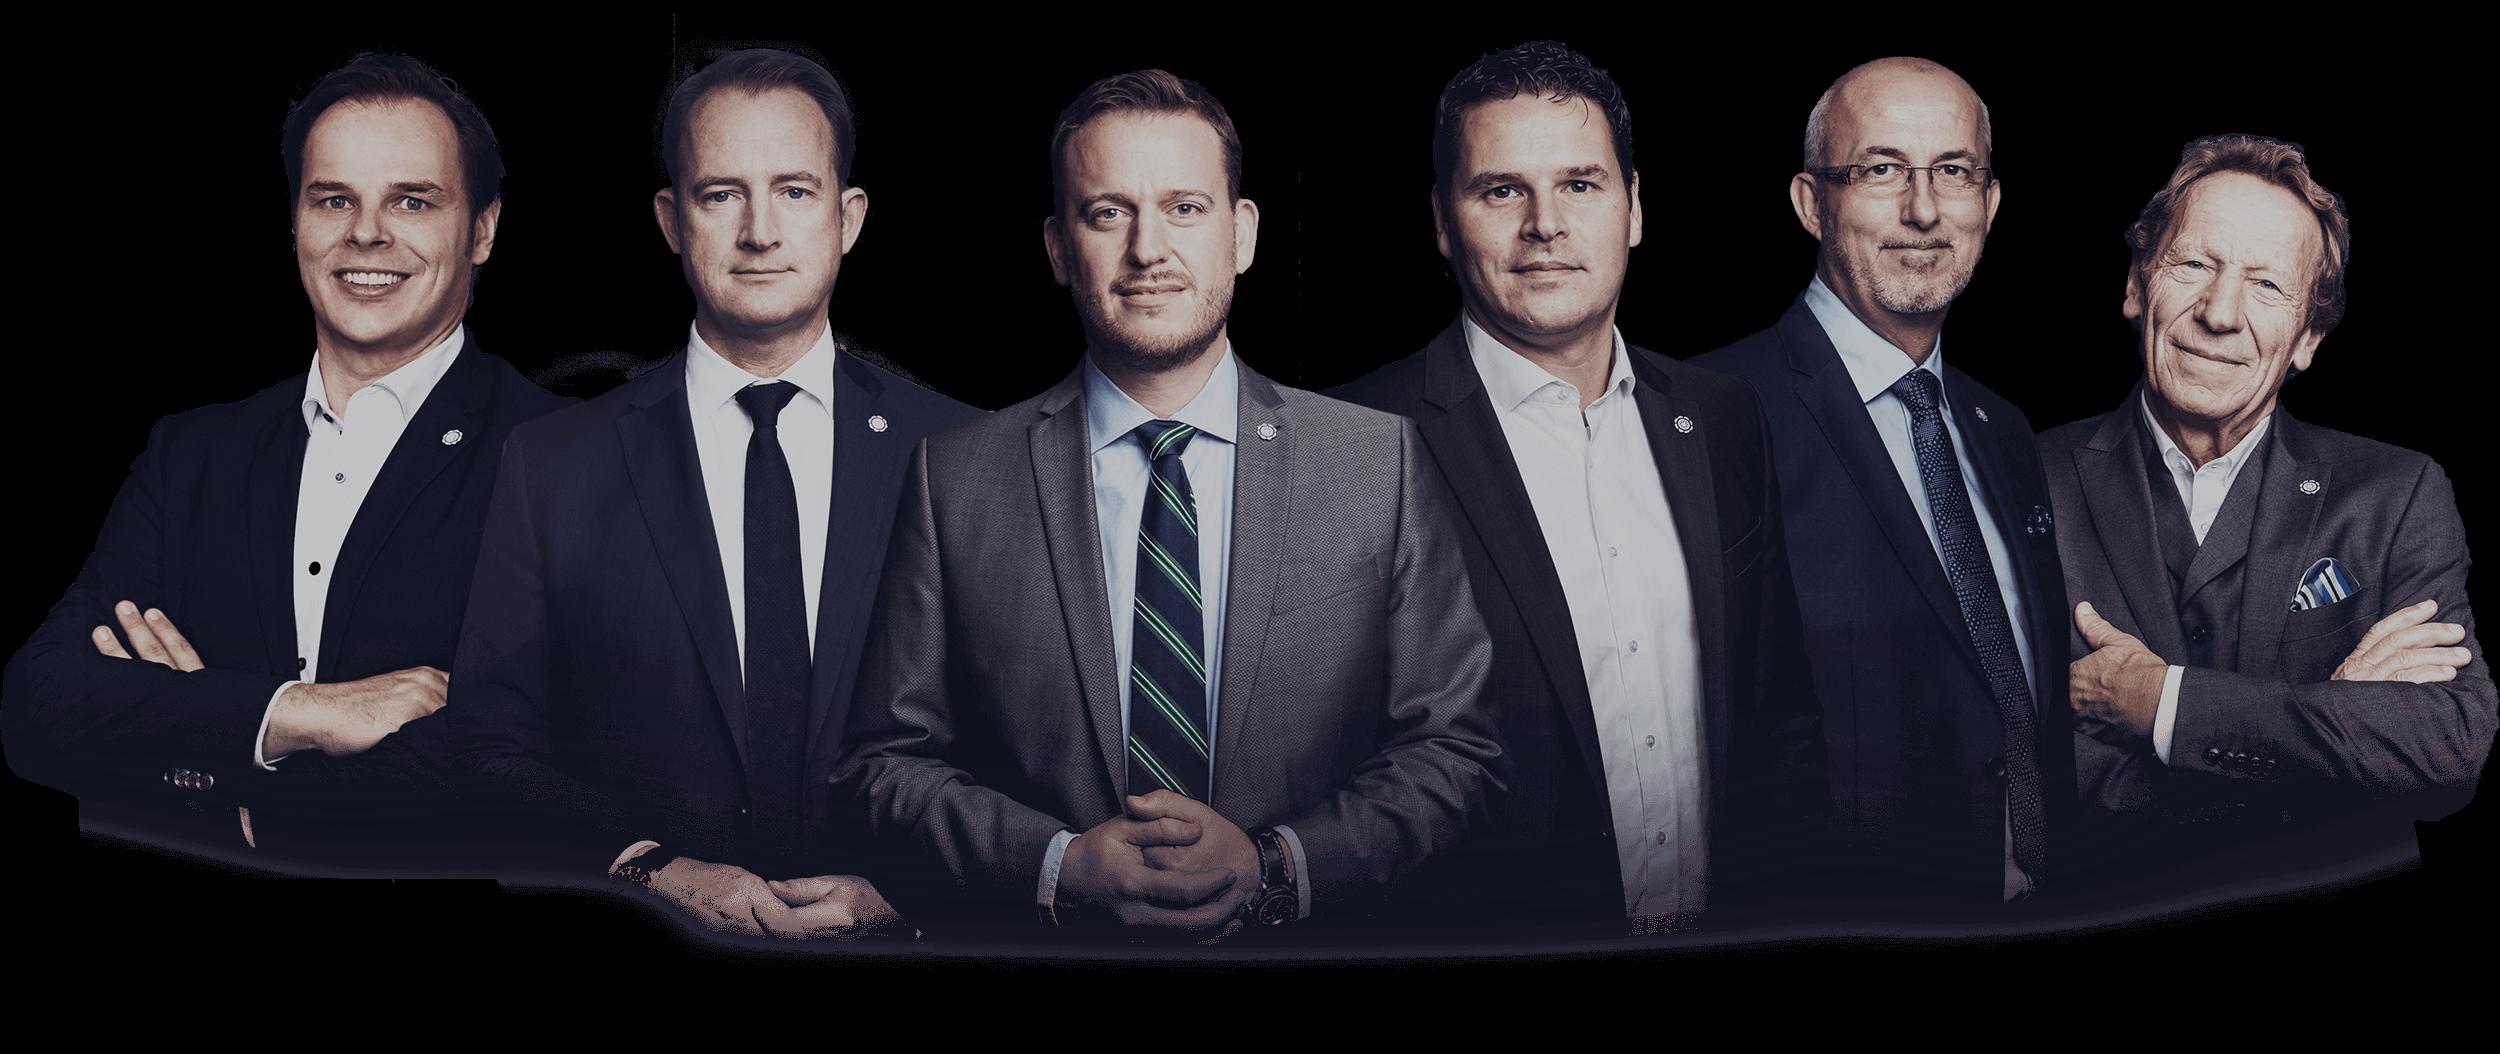 Unuin Gruppe - Grünbaum & Collegen - Partner